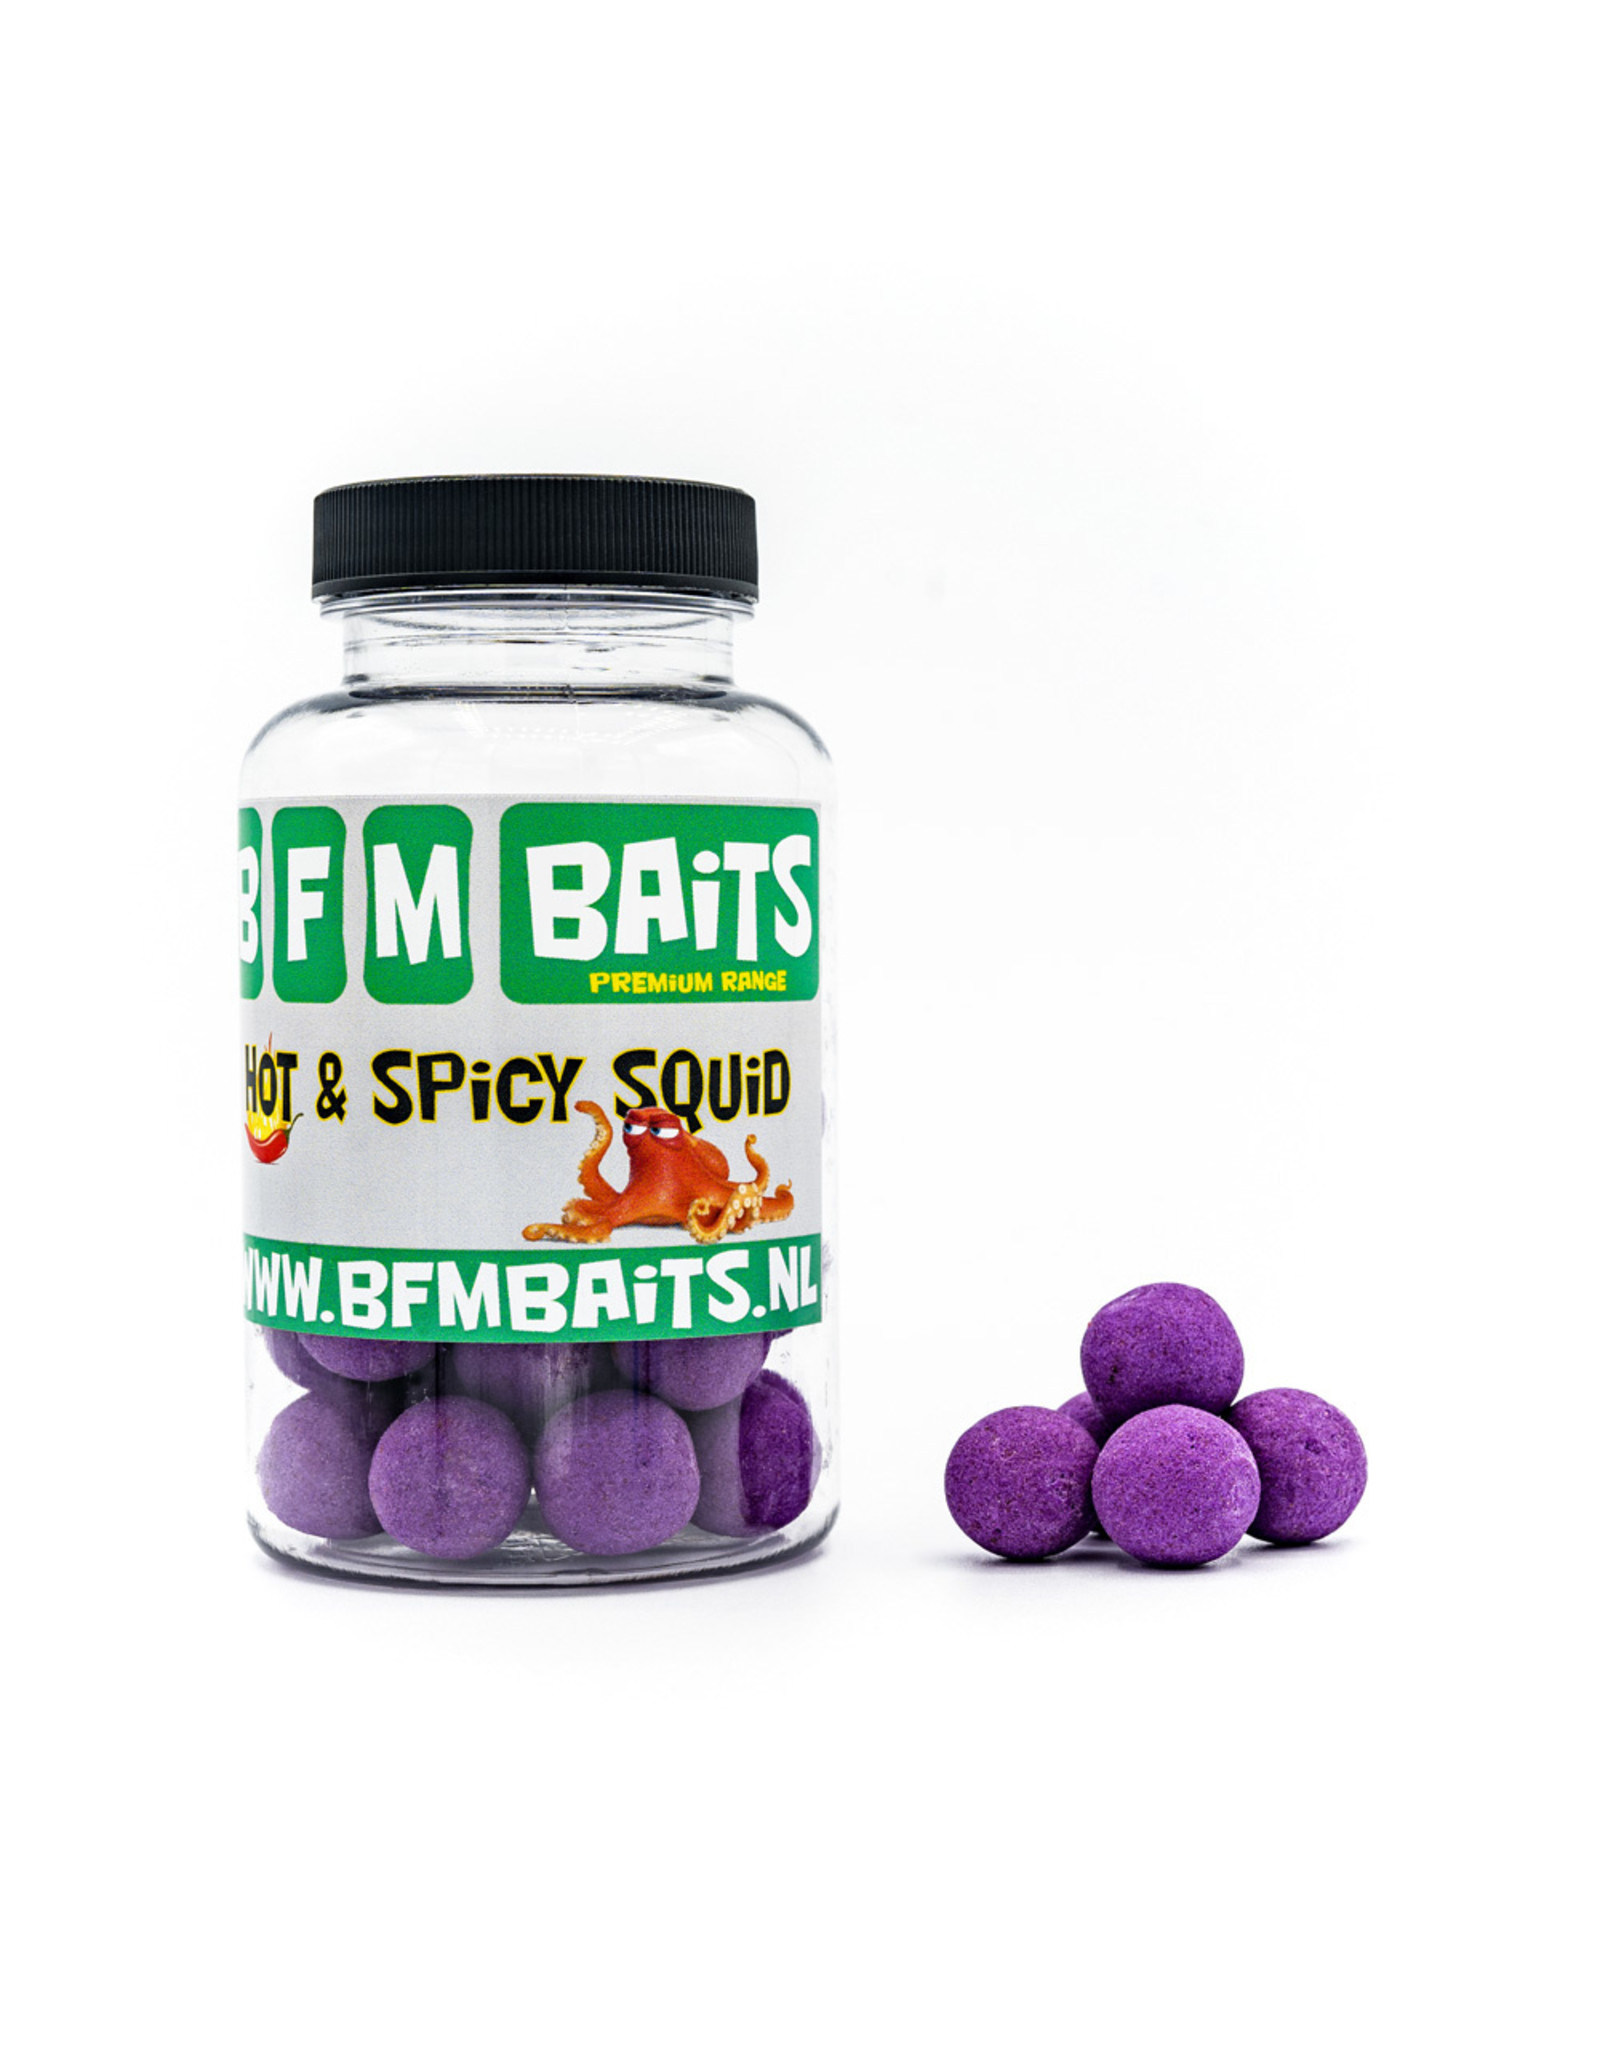 BFM Baits Hot & Spicy Squid boilies - Bucket deal